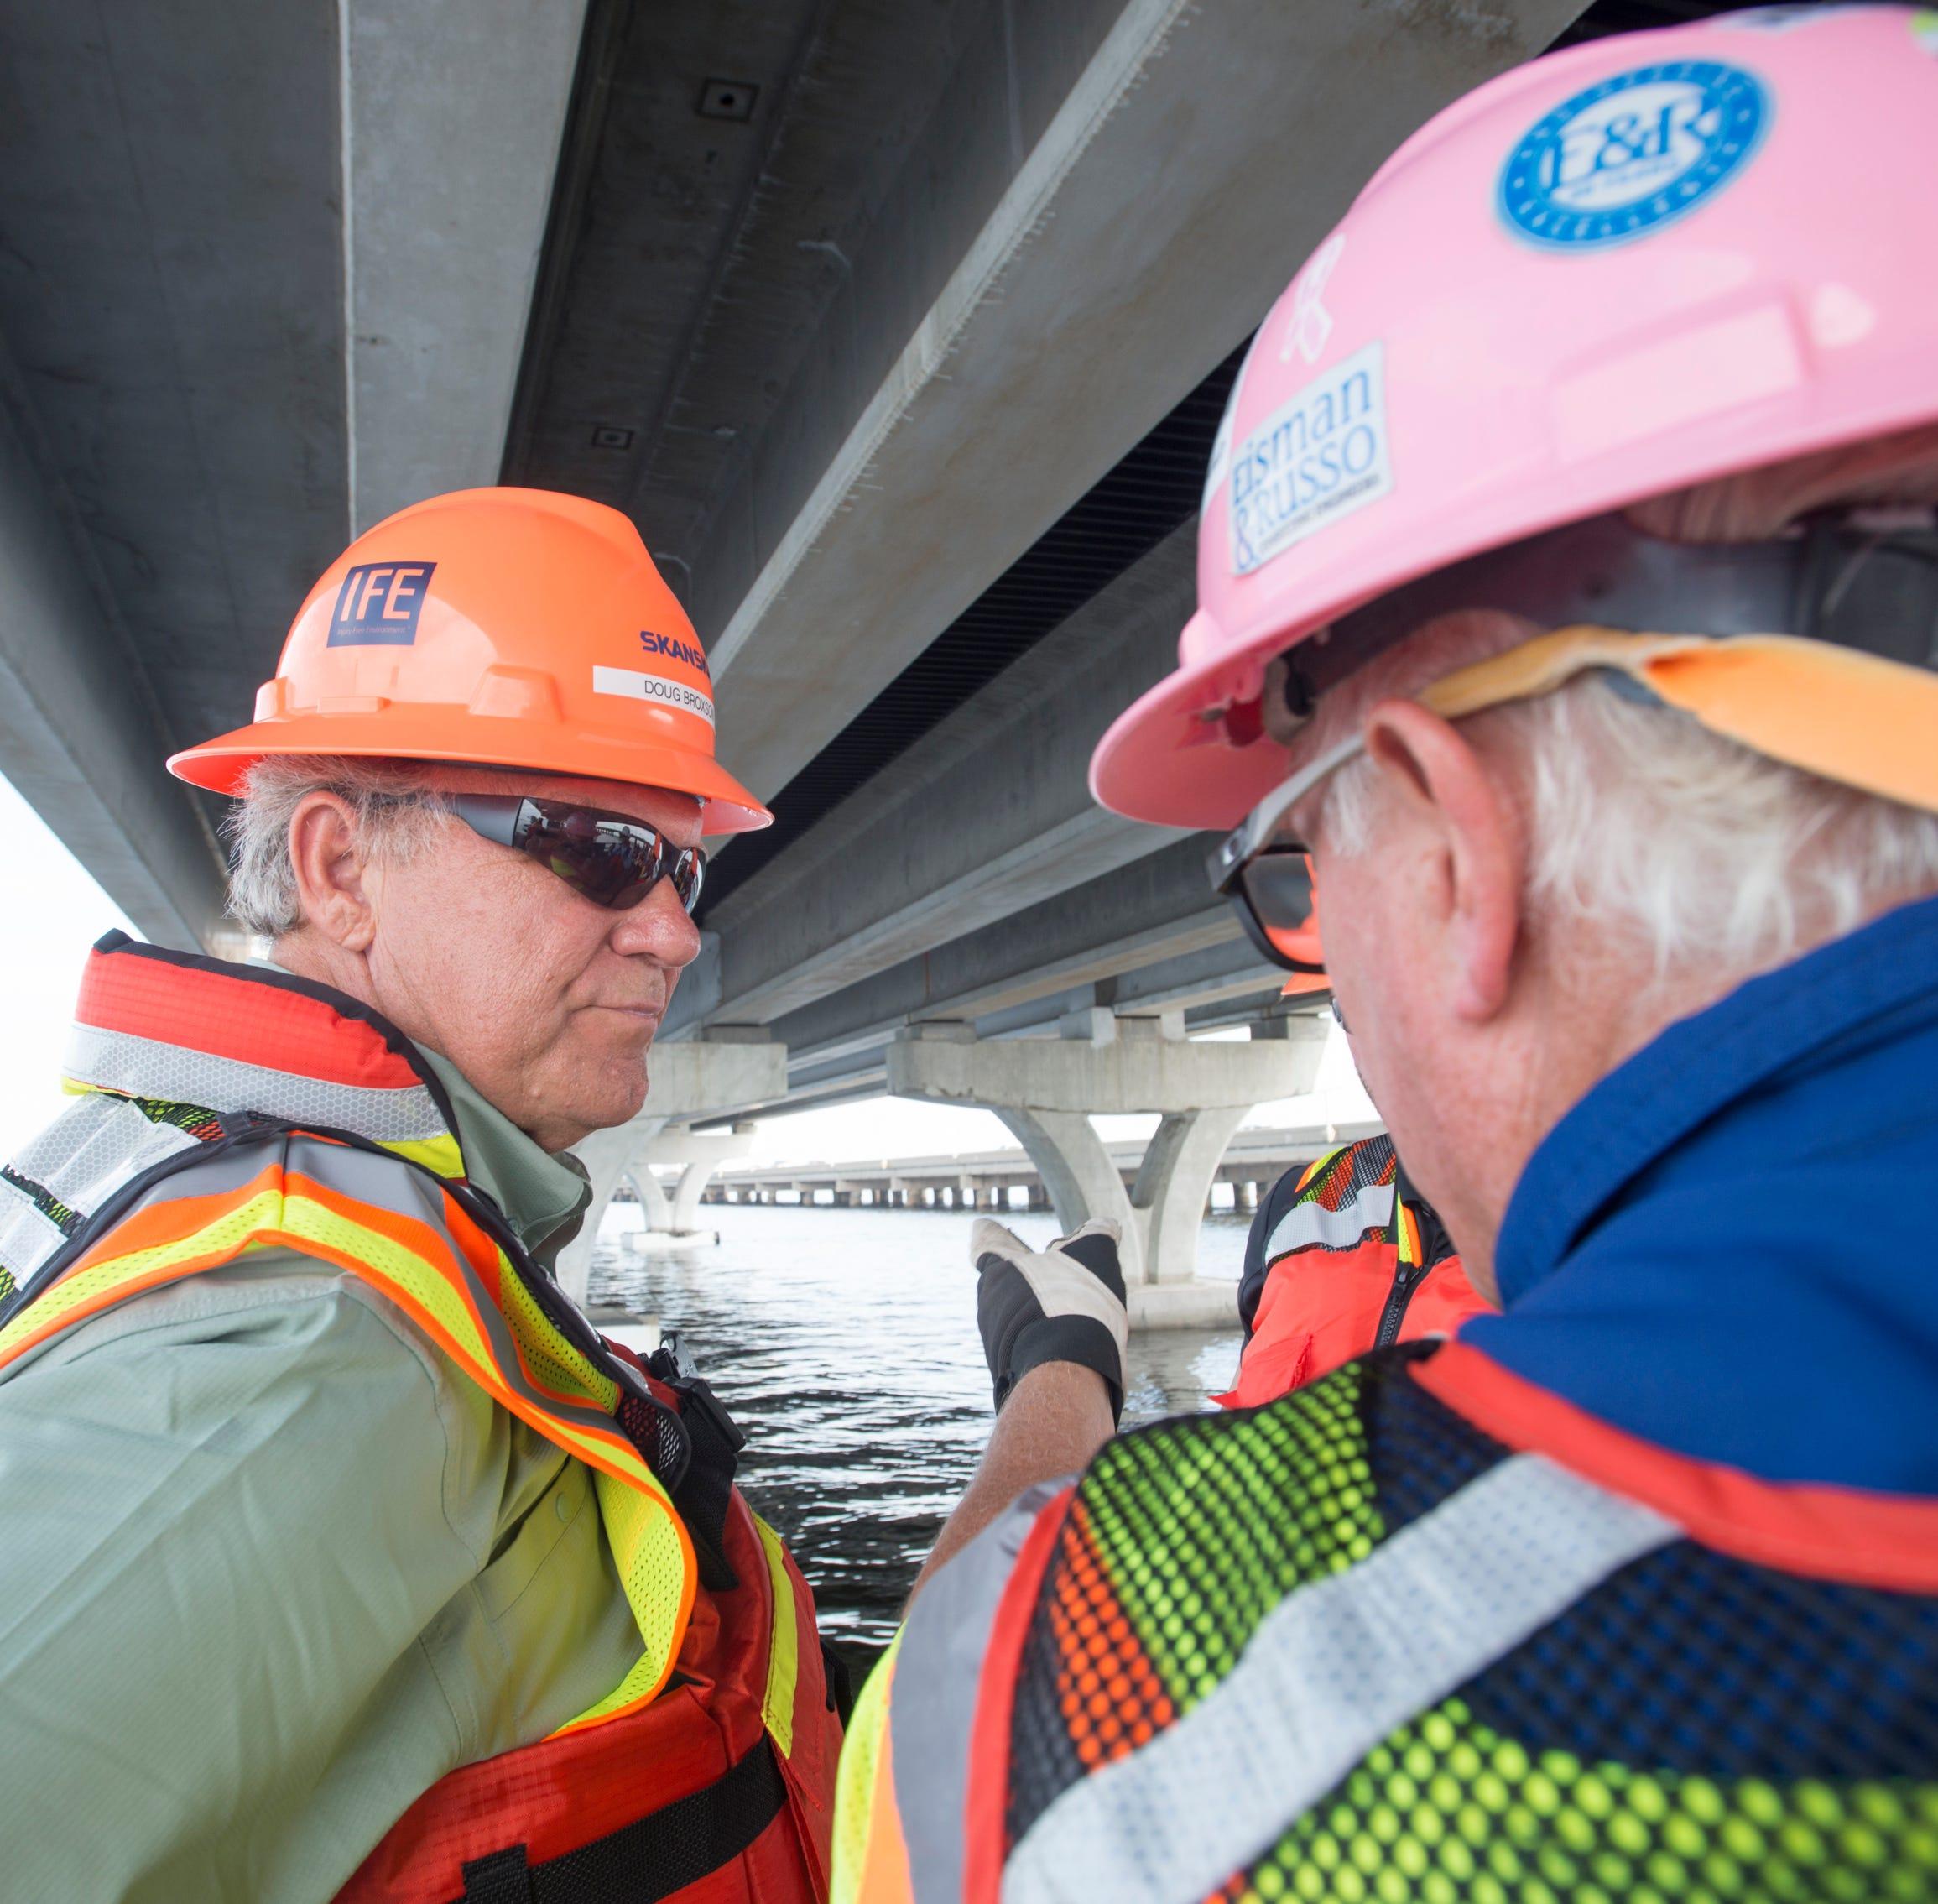 Senator seeks to reassure public about cracking on new Pensacola Bay Bridge surface